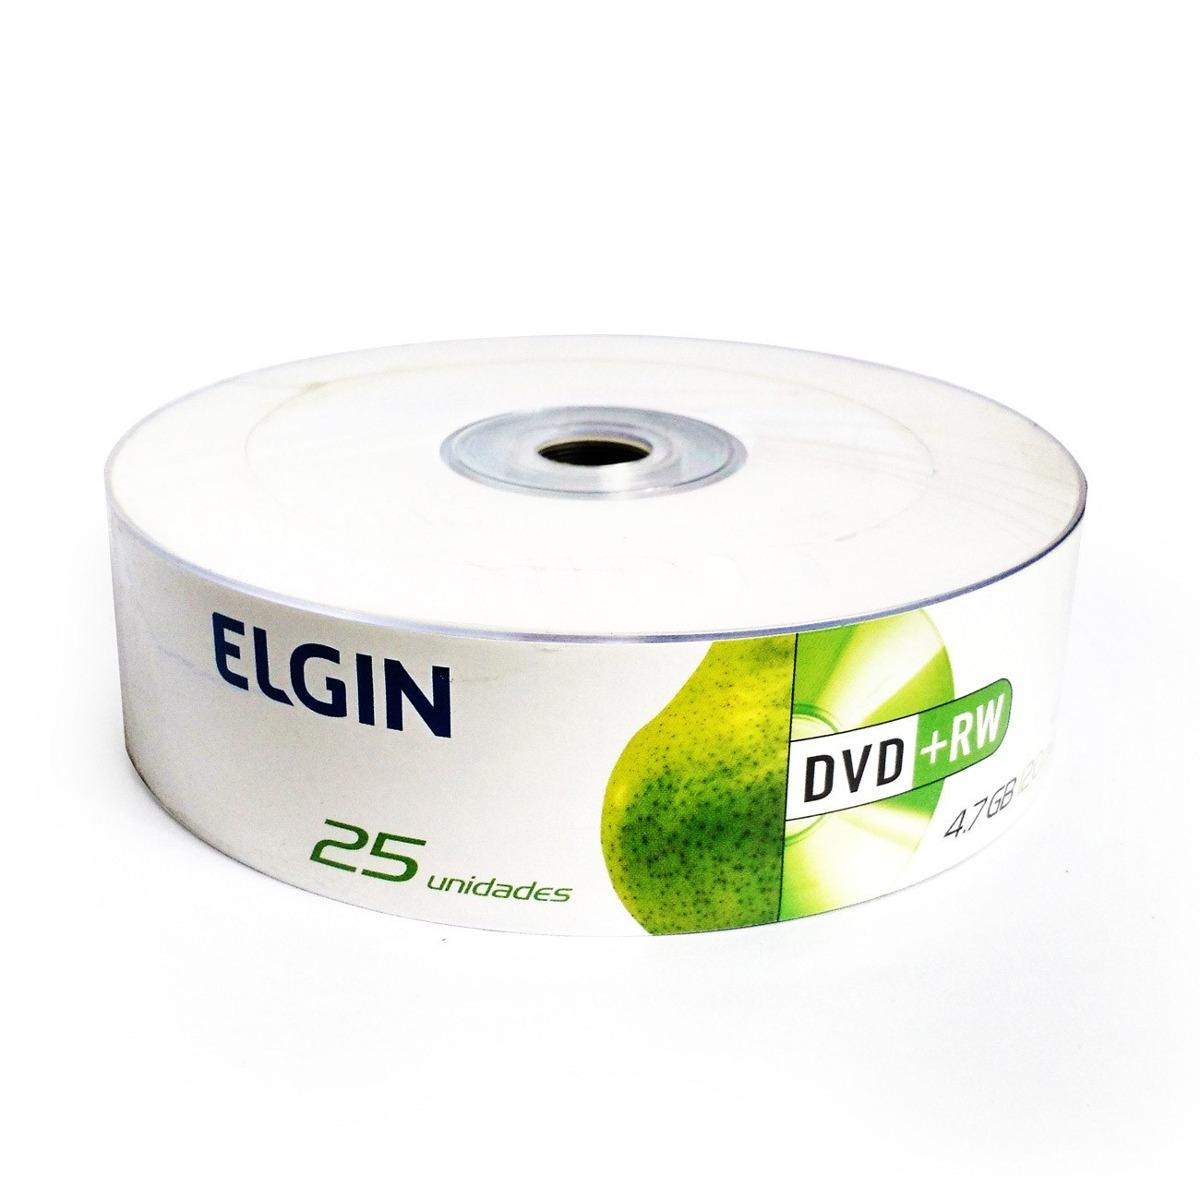 25 DVD+RW Elgin 4.7gb 120min